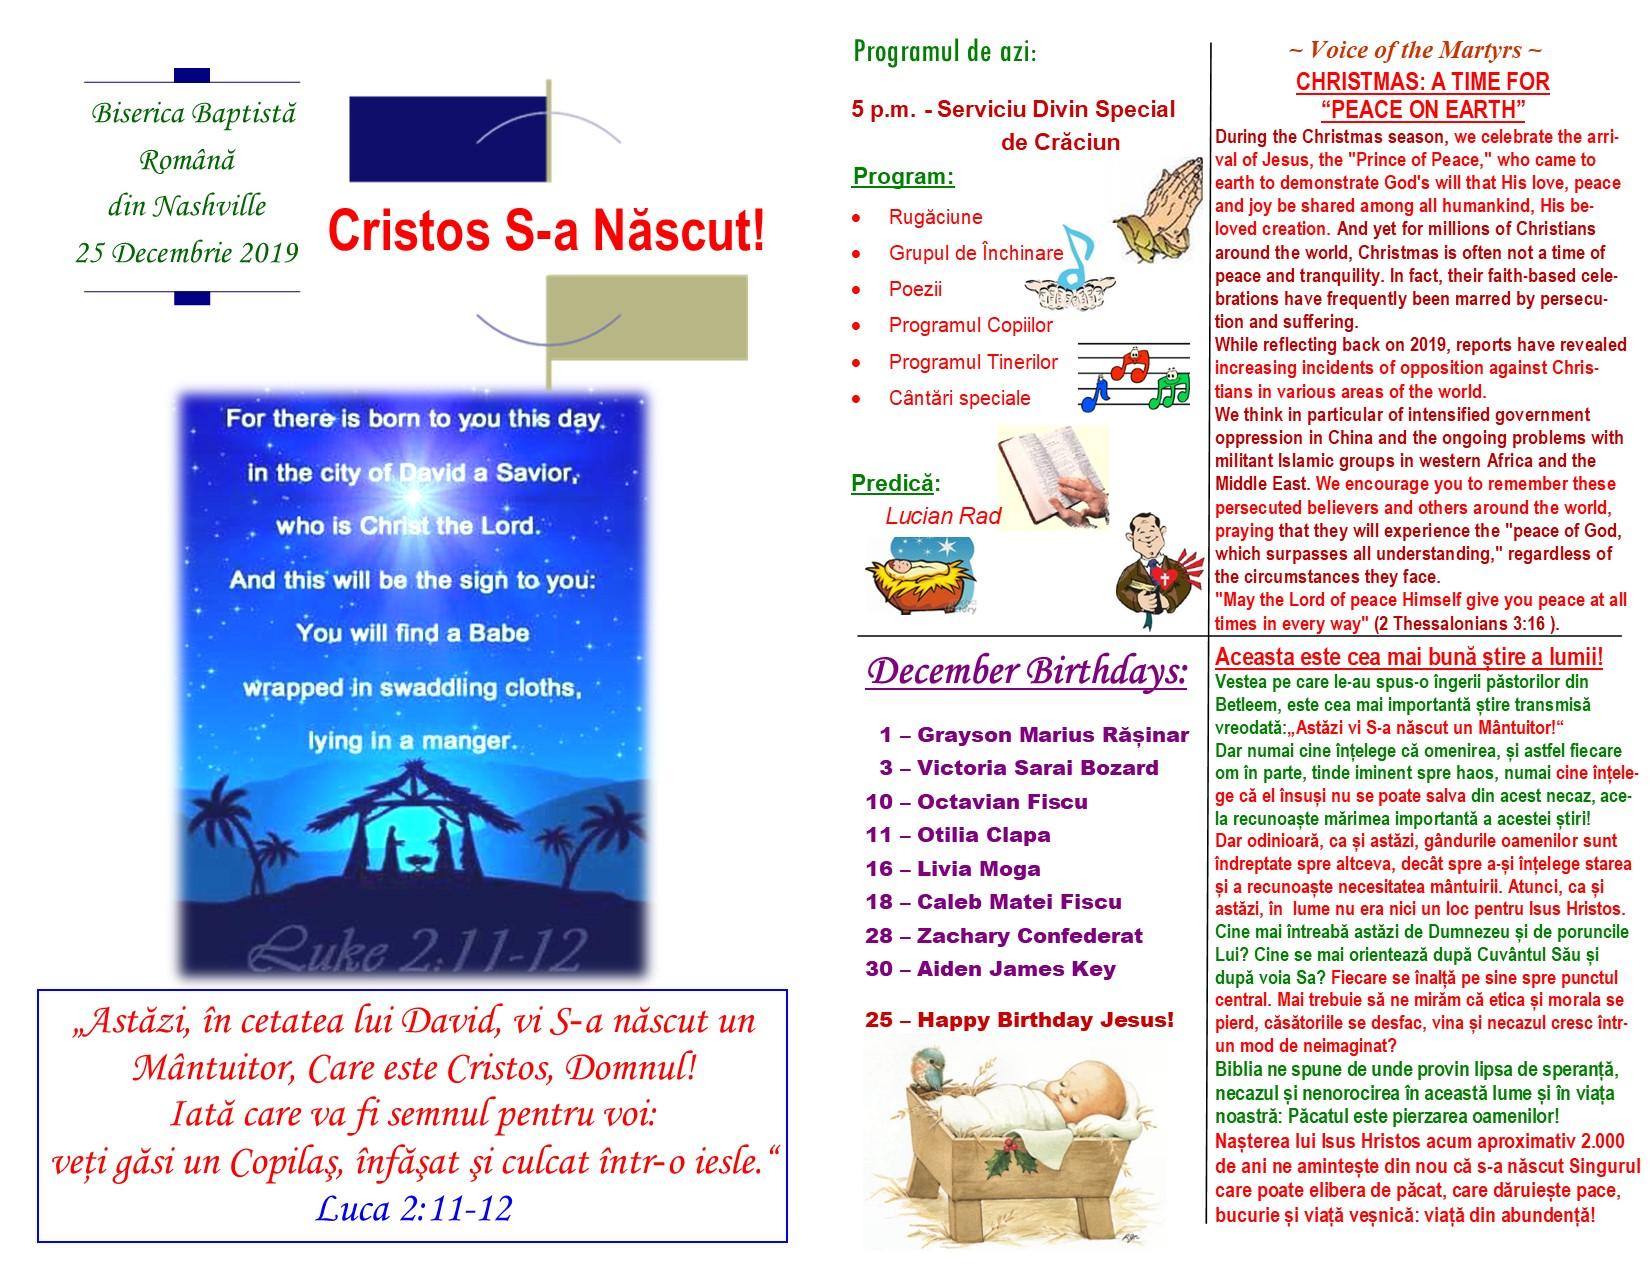 Buletin 12-25-19 page 1 & 2